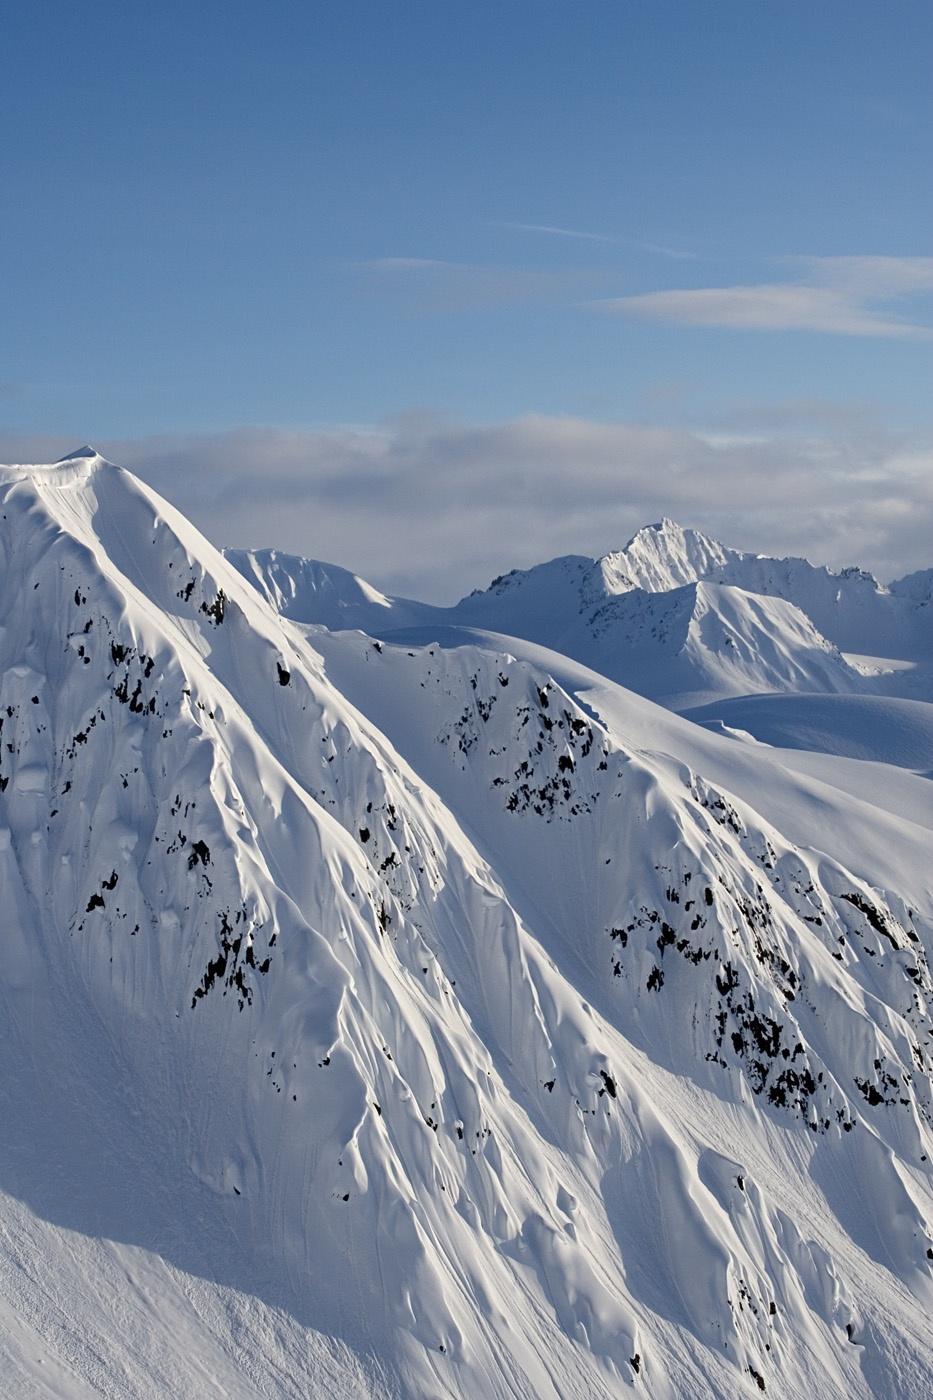 Haines Heli Skiing (9).jpg